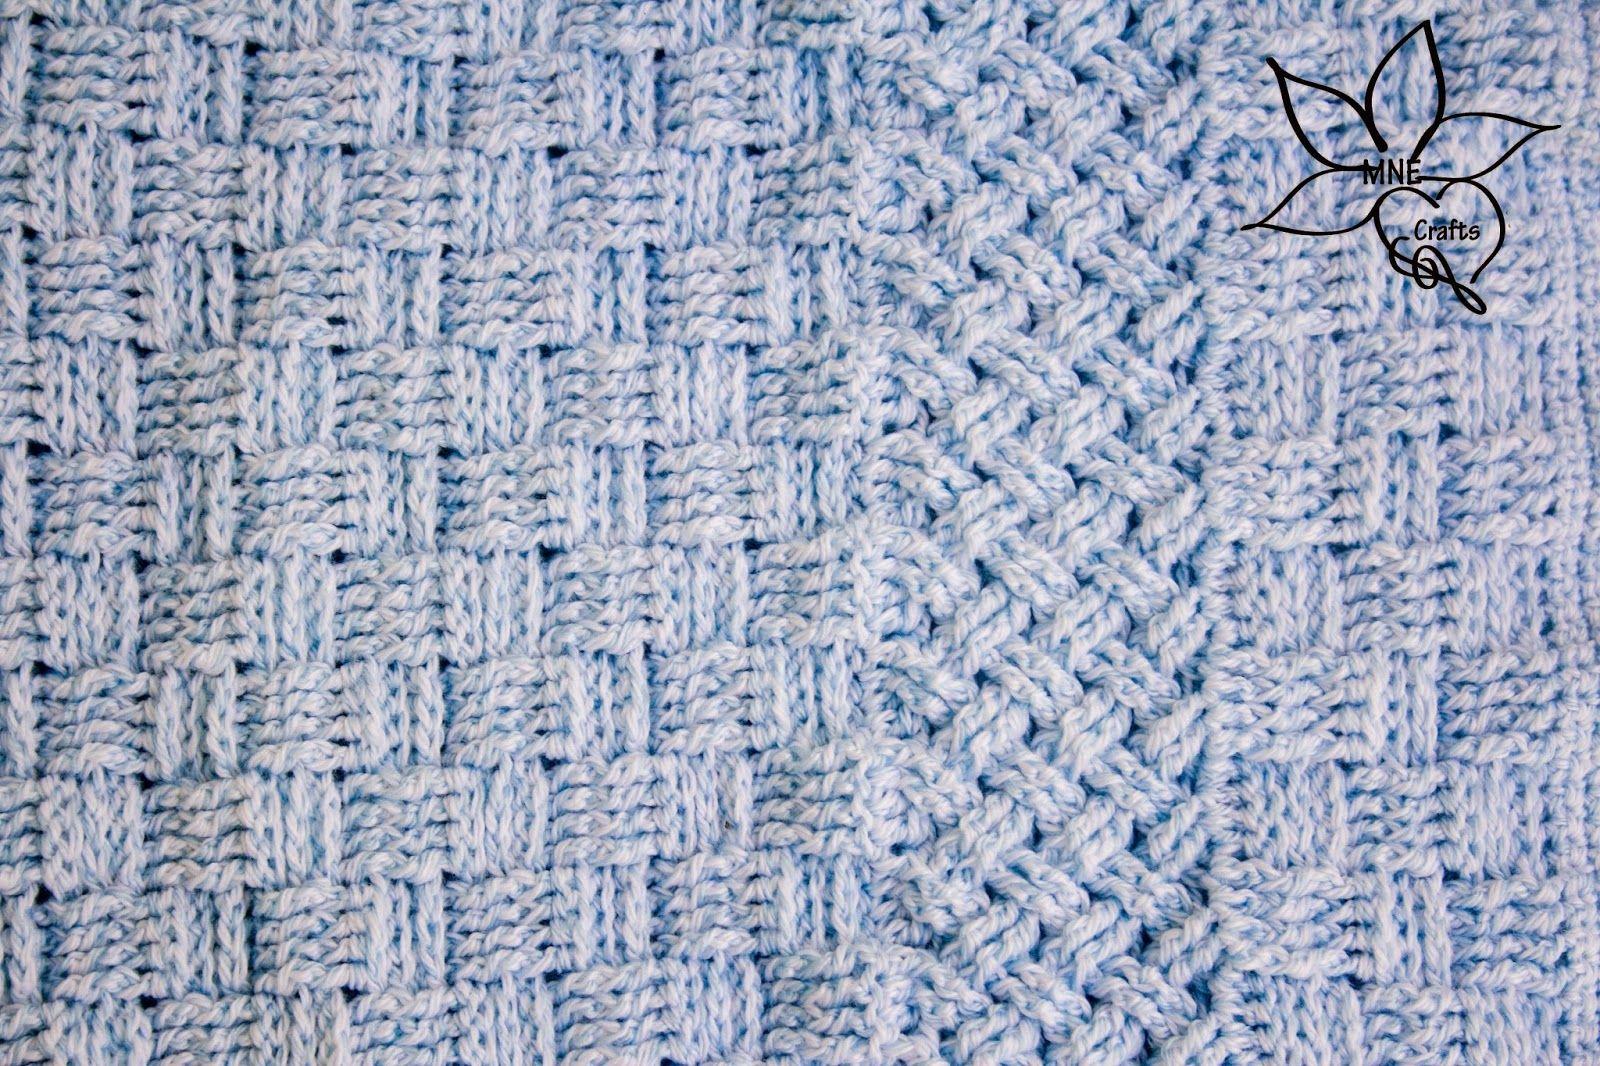 MNE Crafts: A Woven Crochet Baby Blanket | mayo | Pinterest | Cobija ...